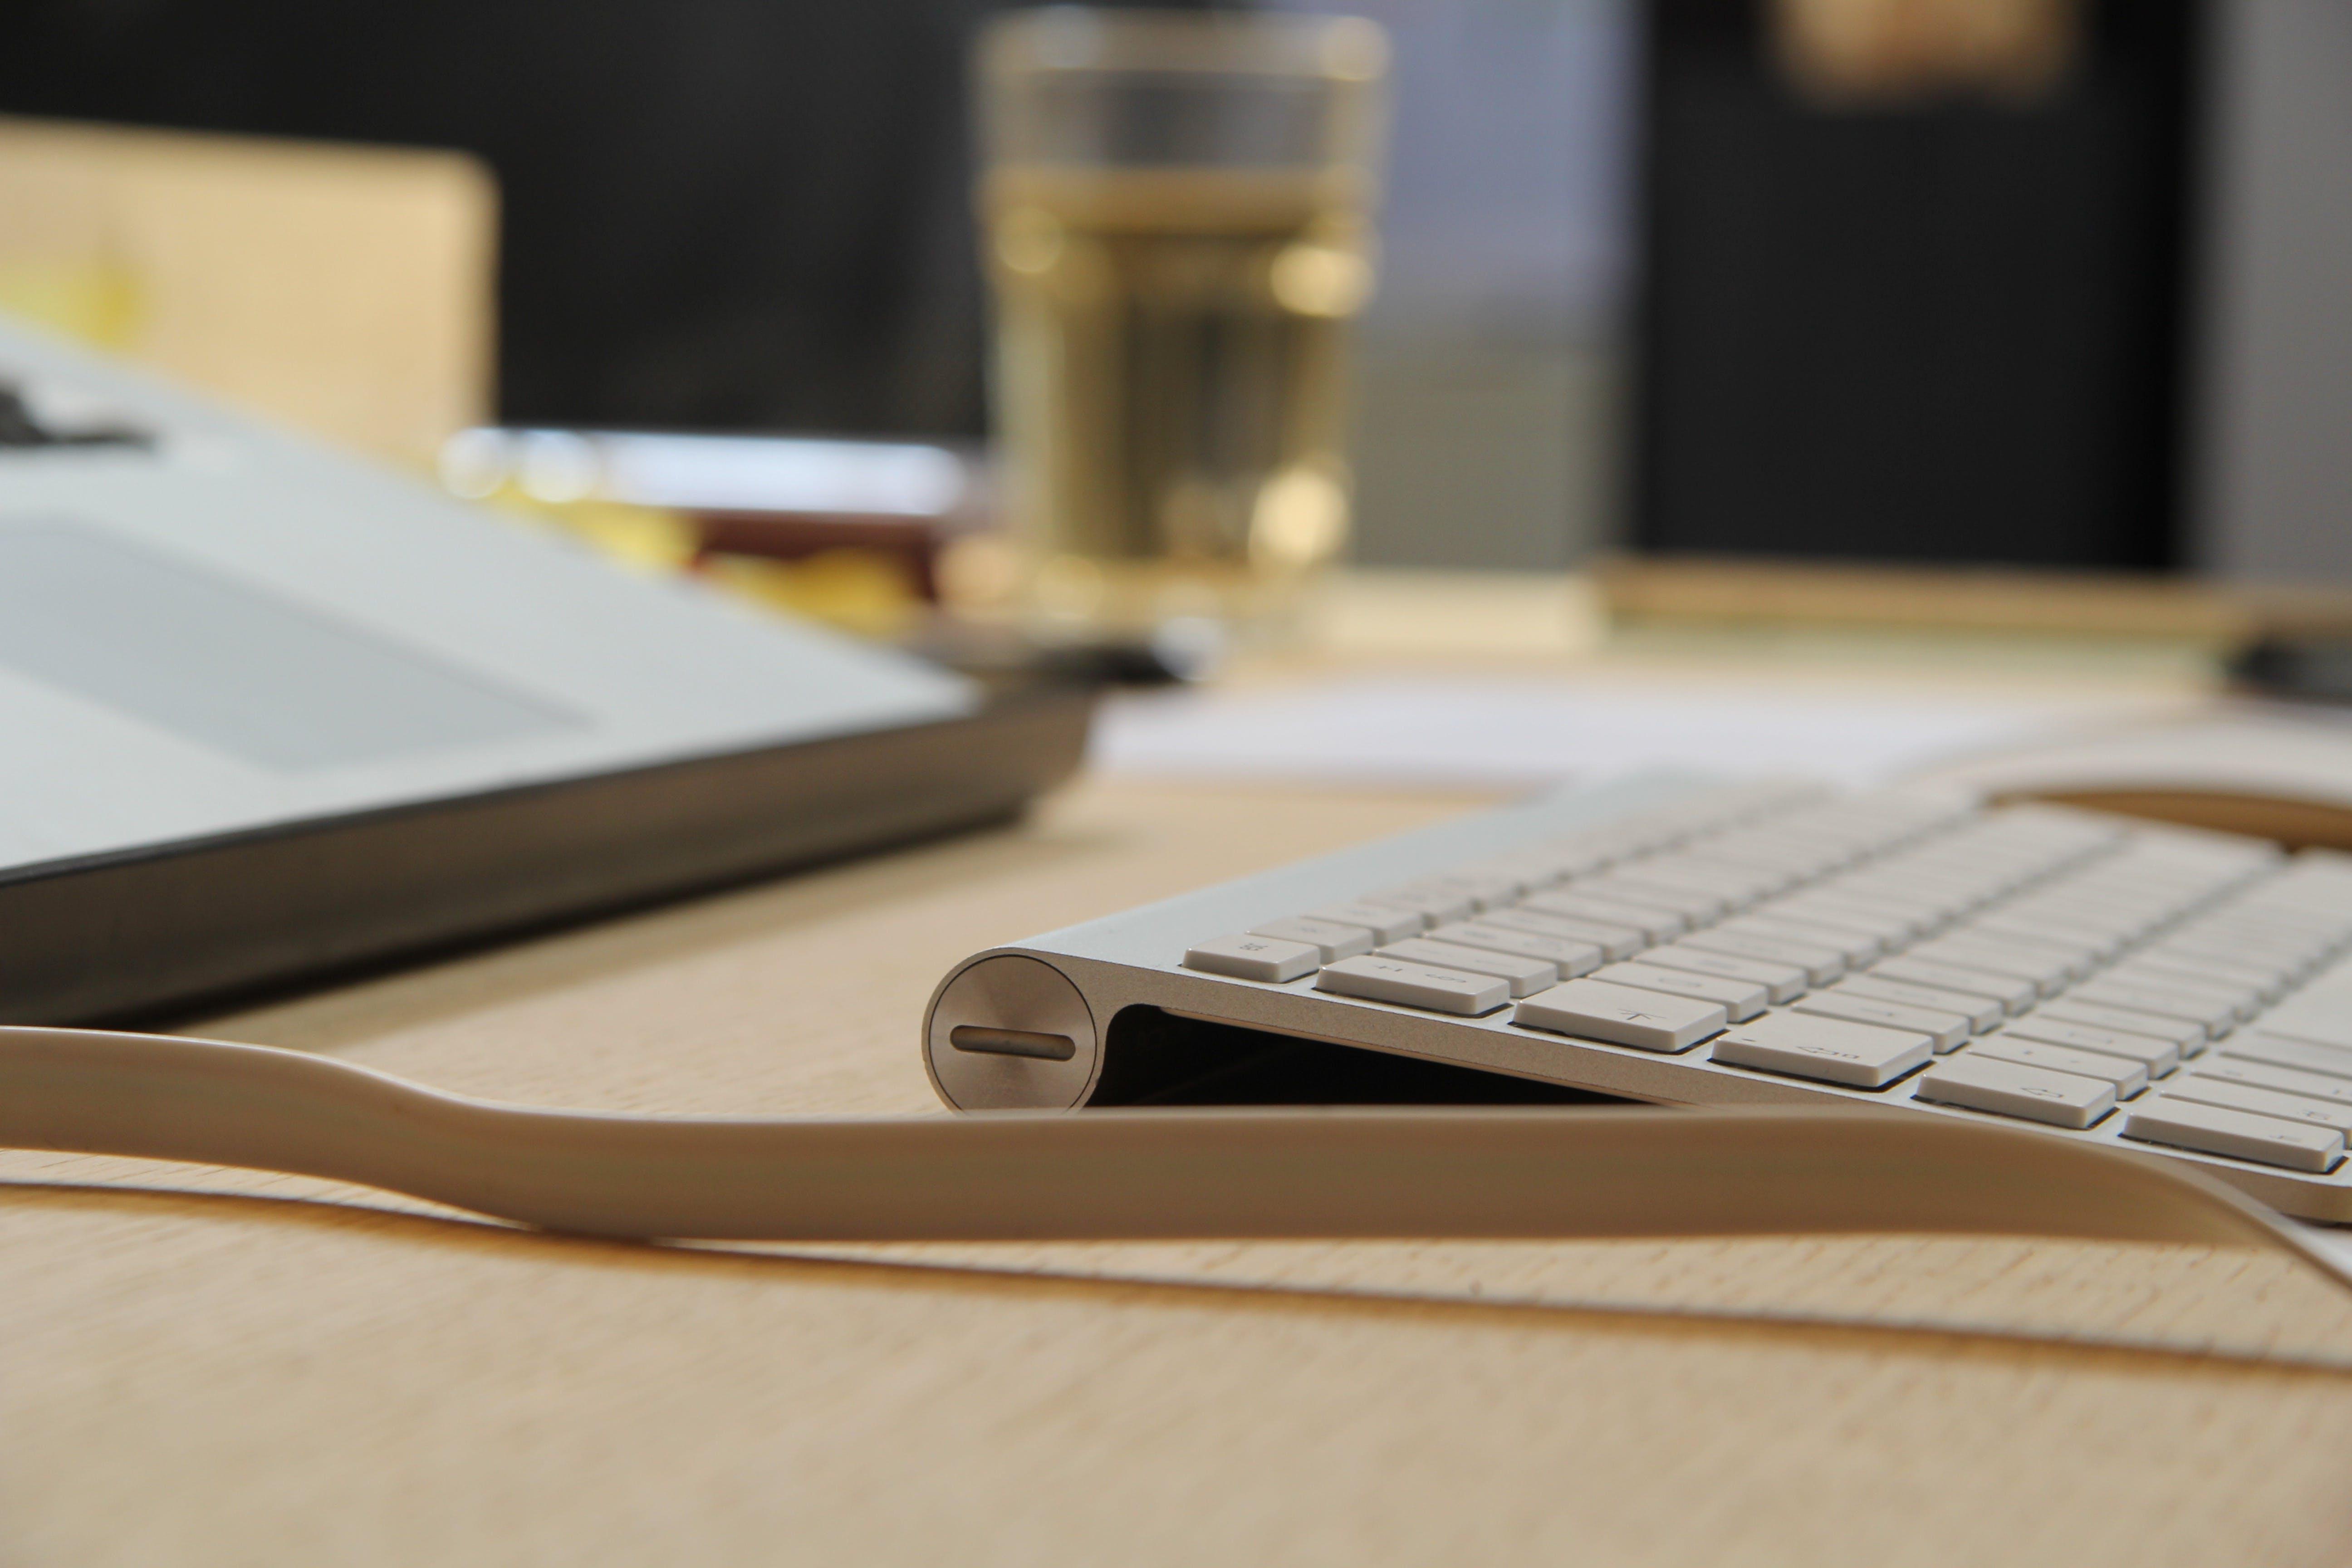 Free stock photo of keyboard, macbook, office